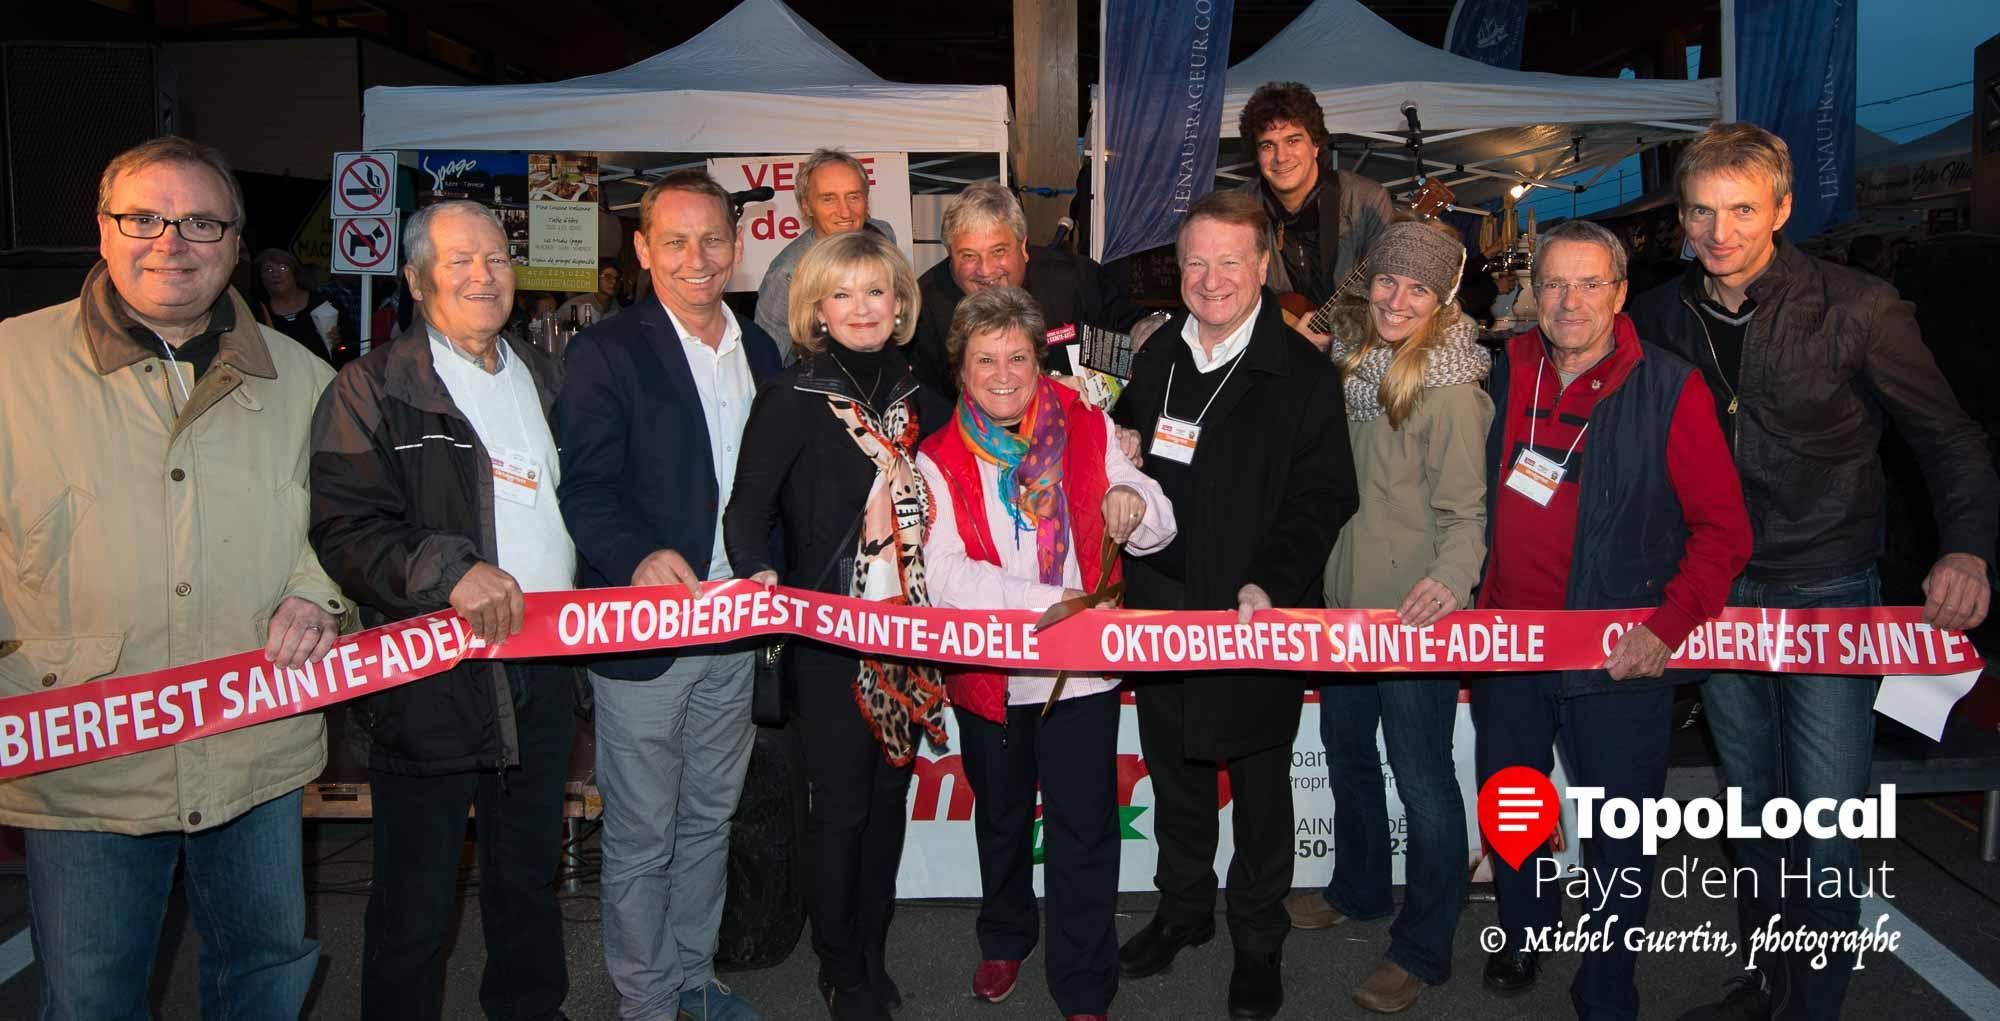 20160930-sainte-adele-ocktobierfest-place-citoyens-5